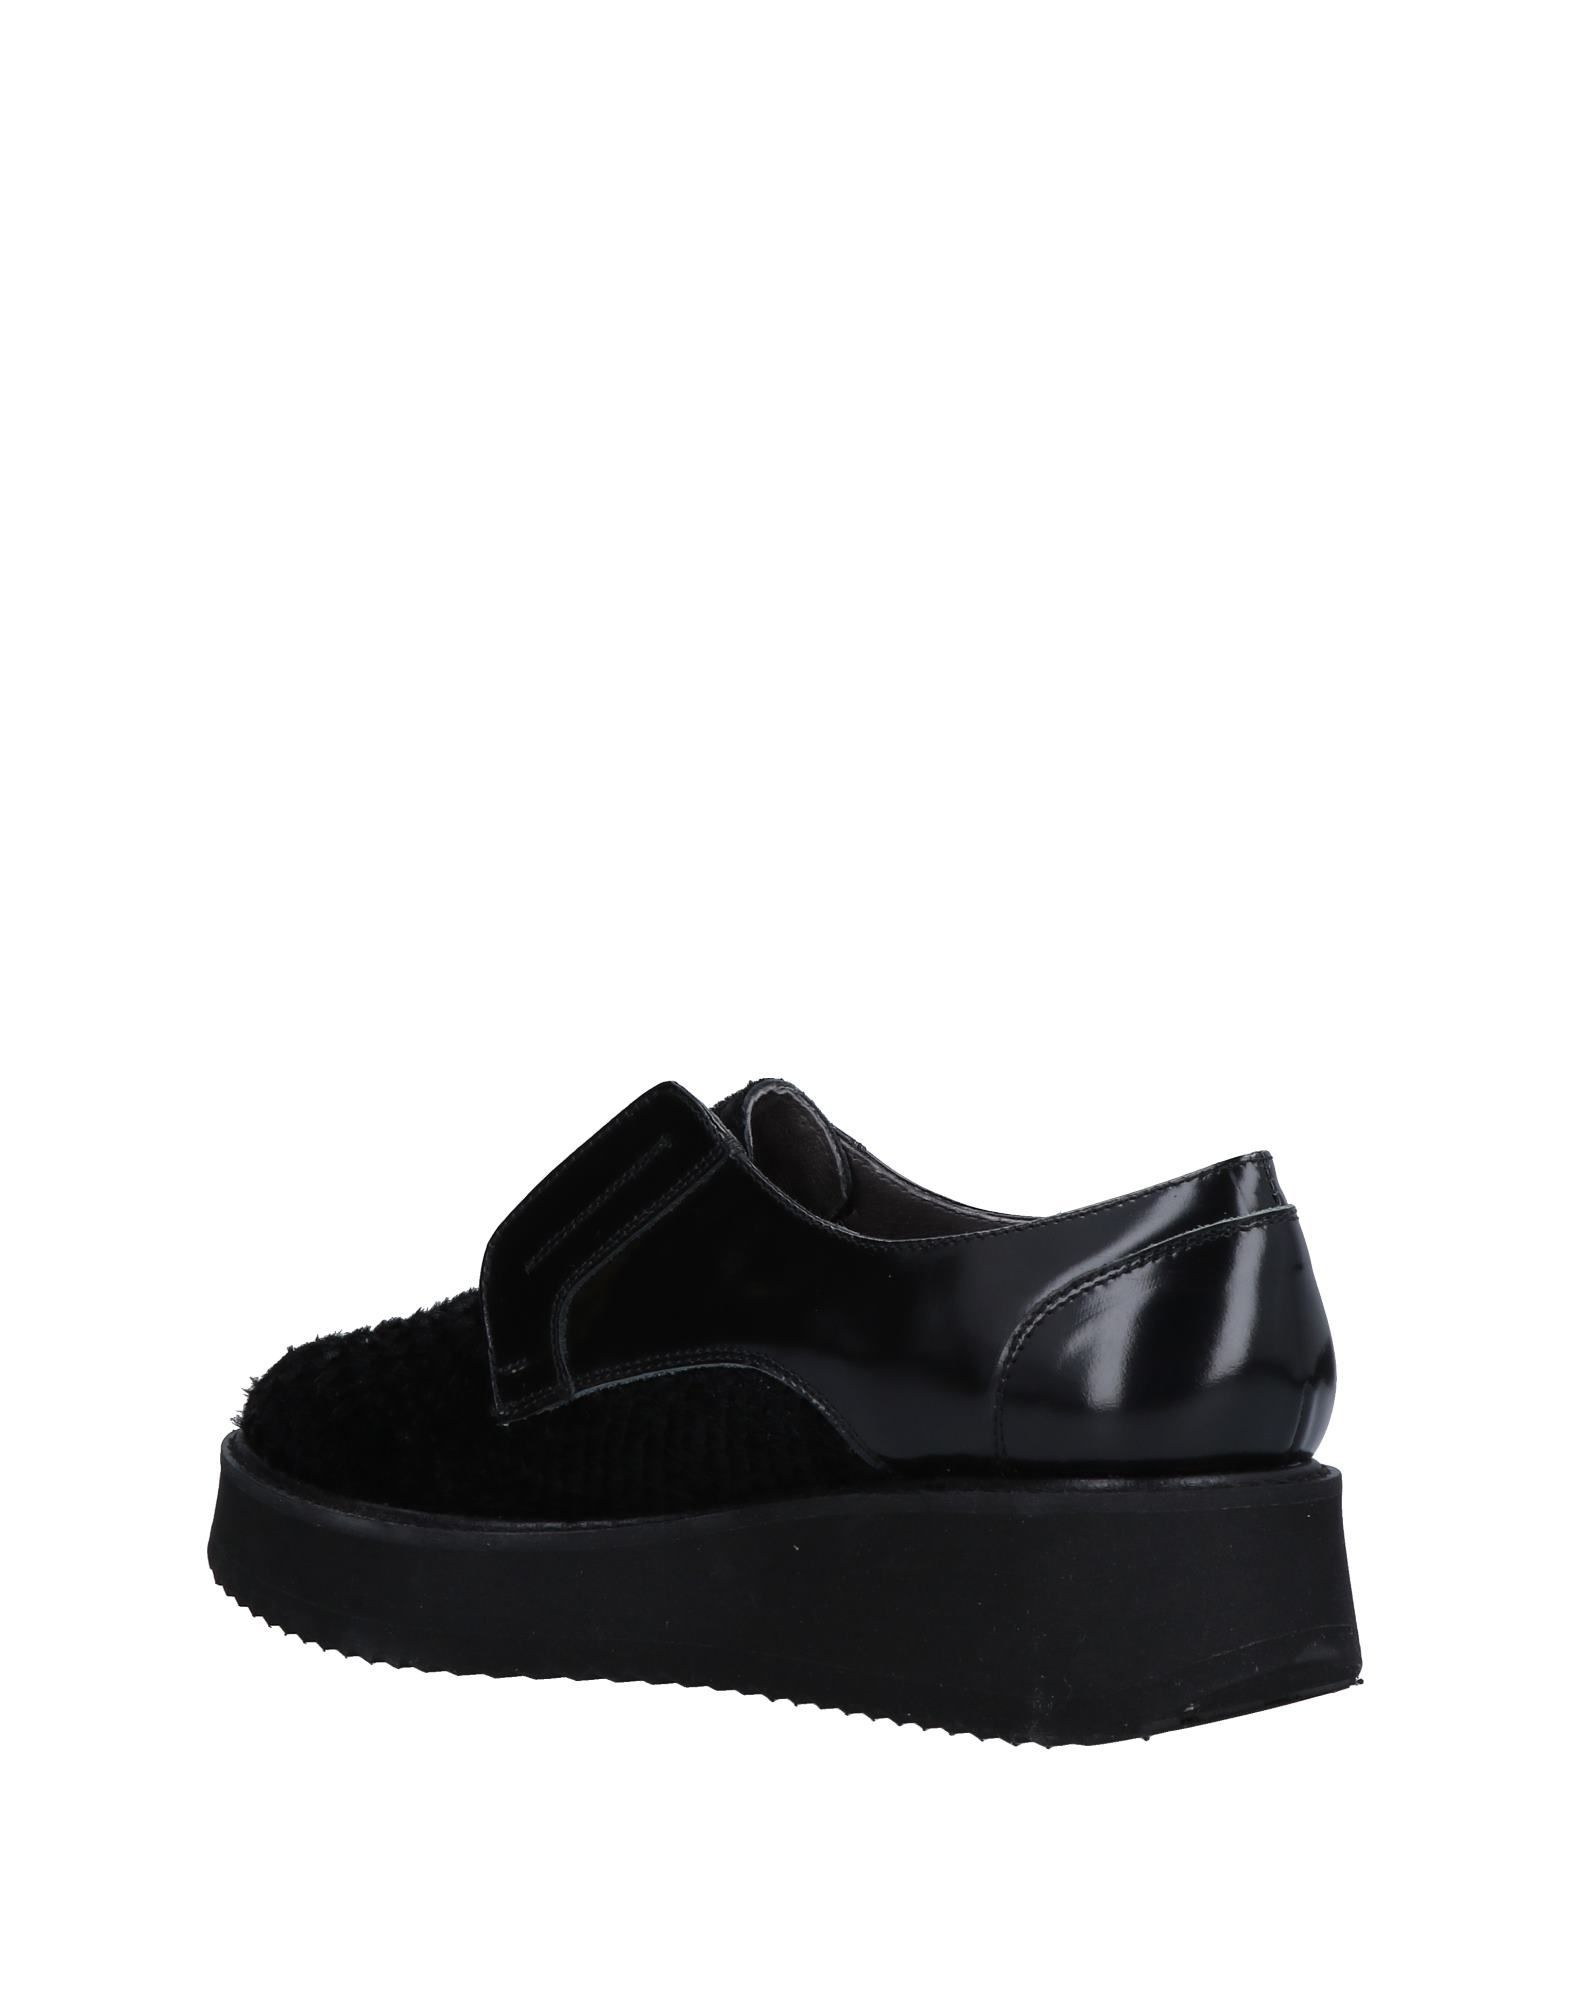 FOOTWEAR Kanna Black Woman Leather